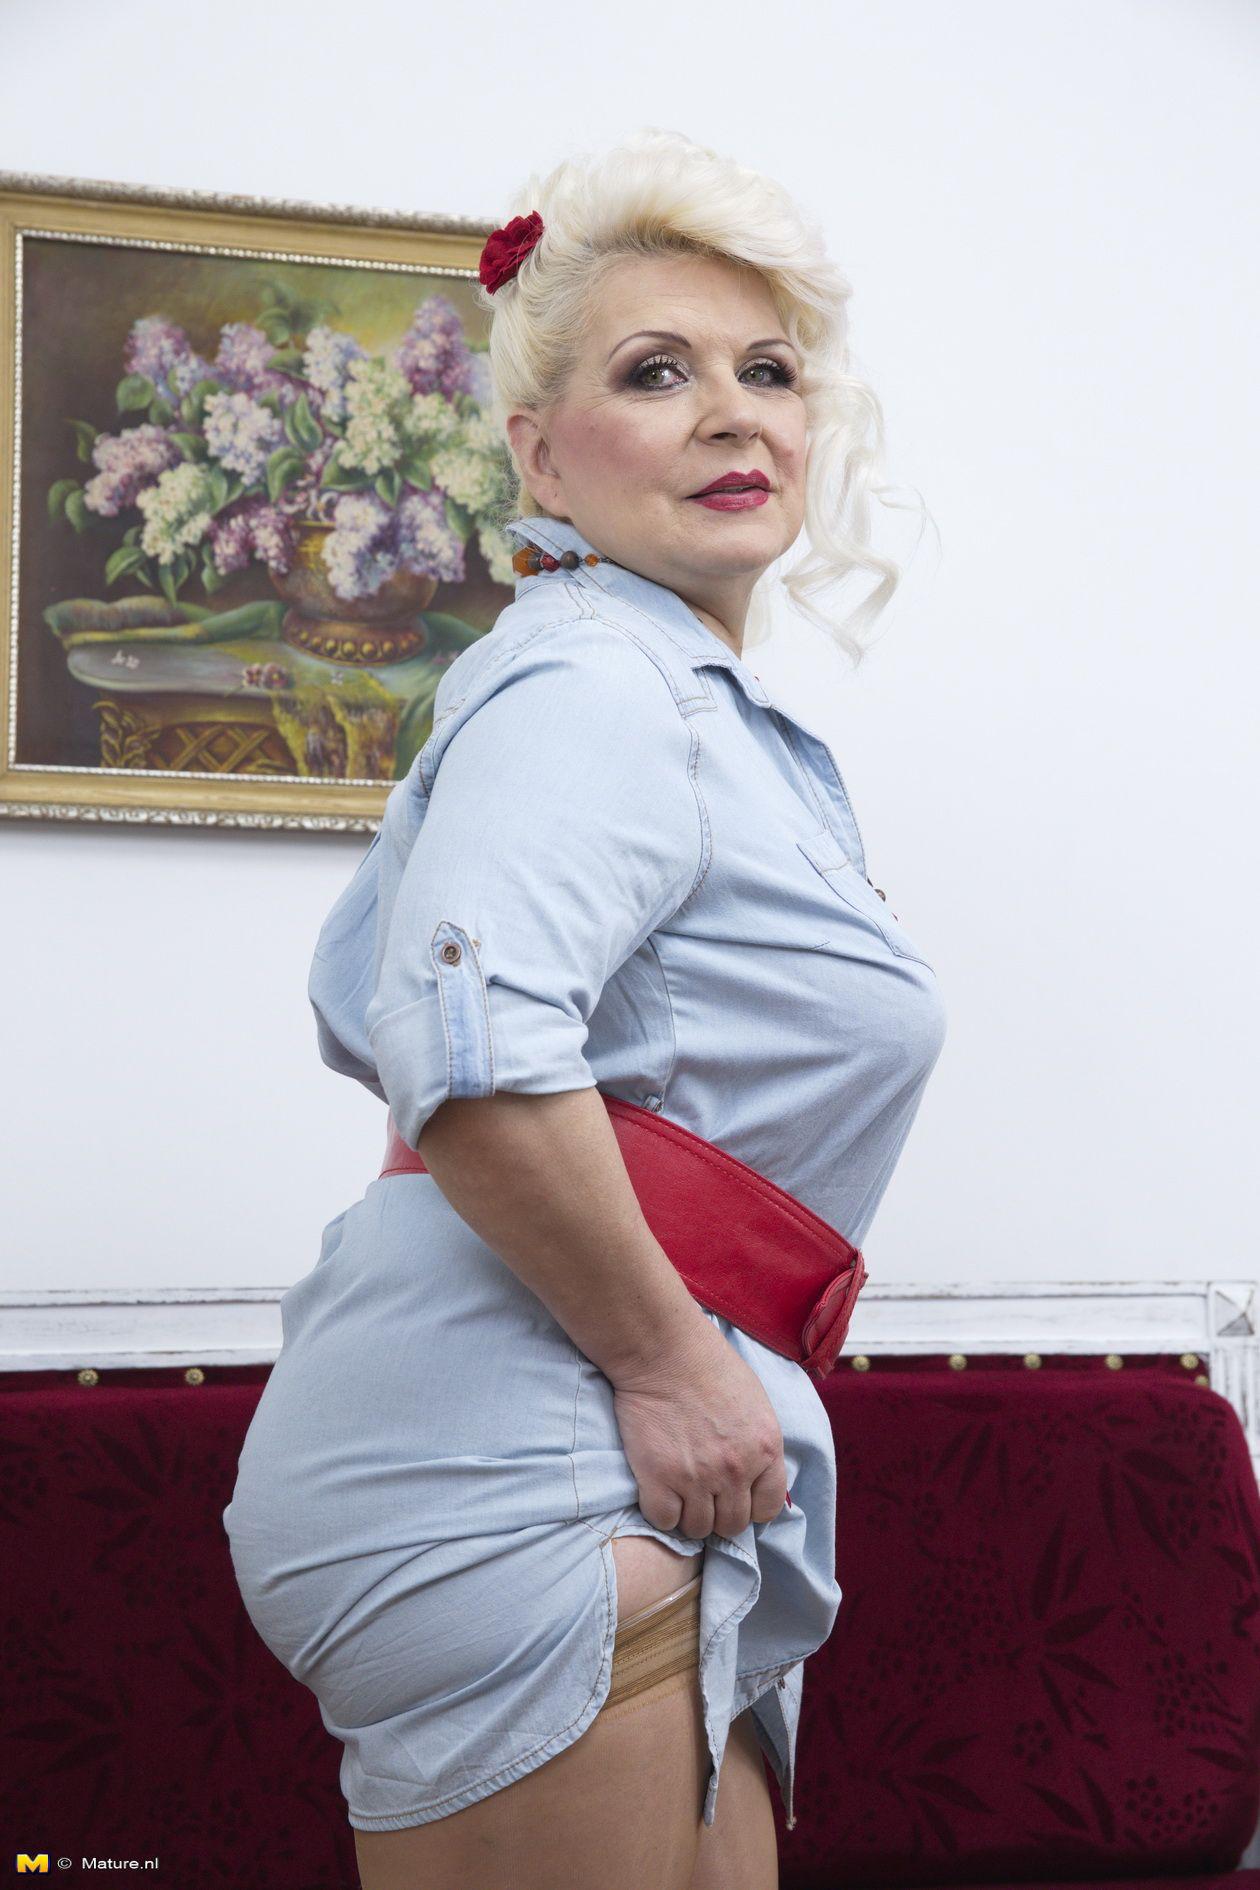 Hot Older Blouse Curvy Hips Old Mature Real Women Older Women